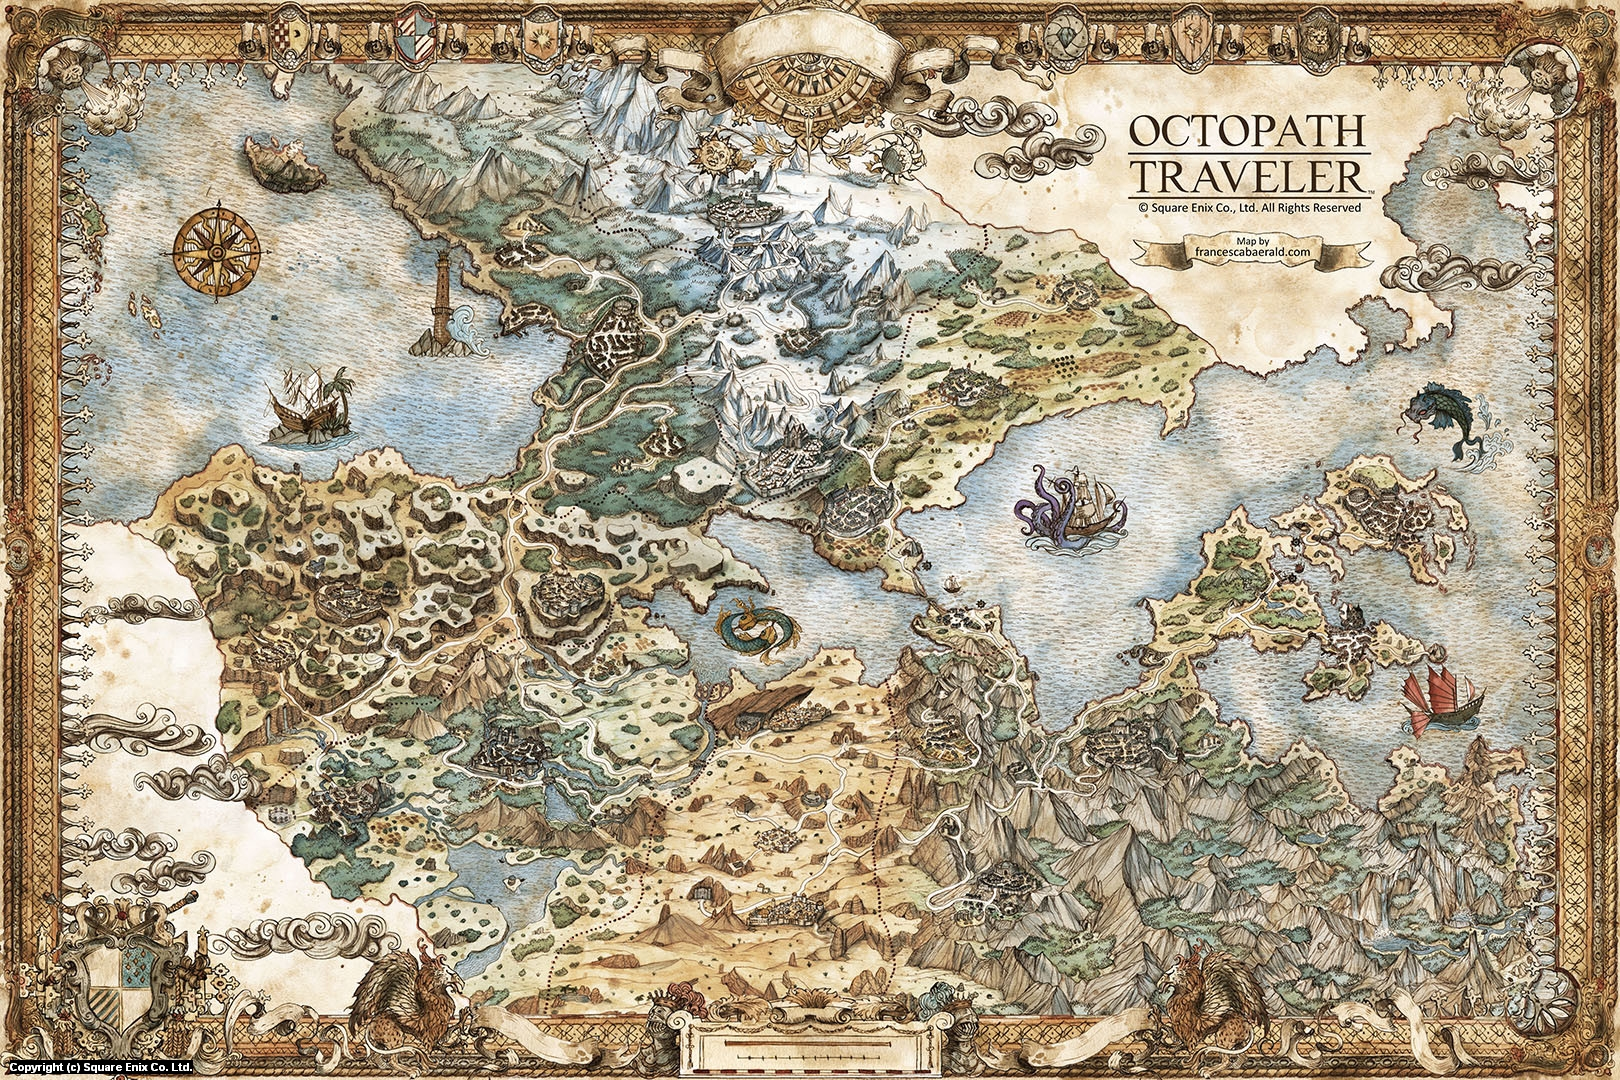 Octopath Traveler Map Artwork by Francesca Baerald